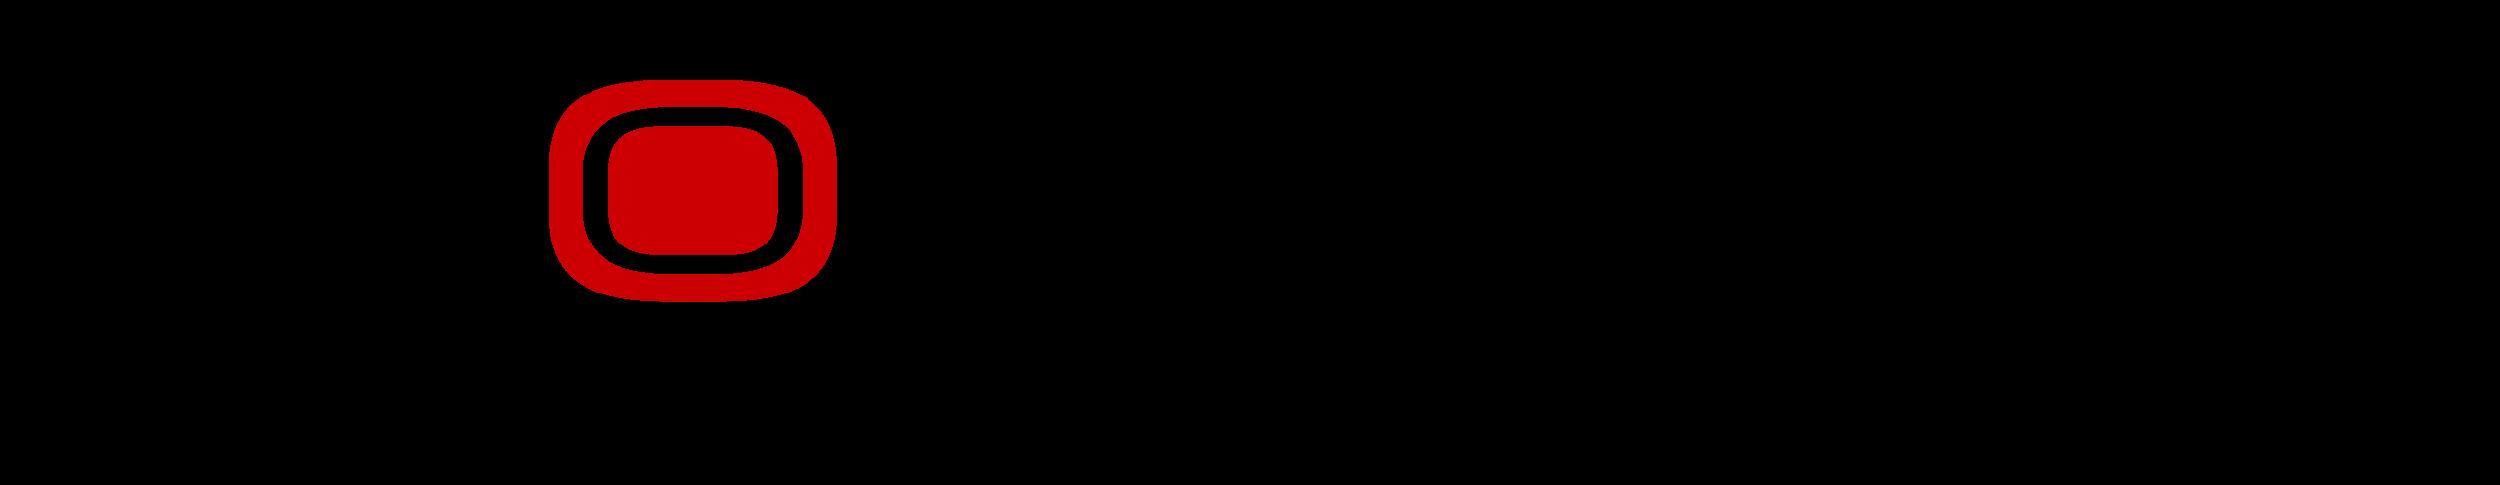 Sportradar-Logo-highres.png